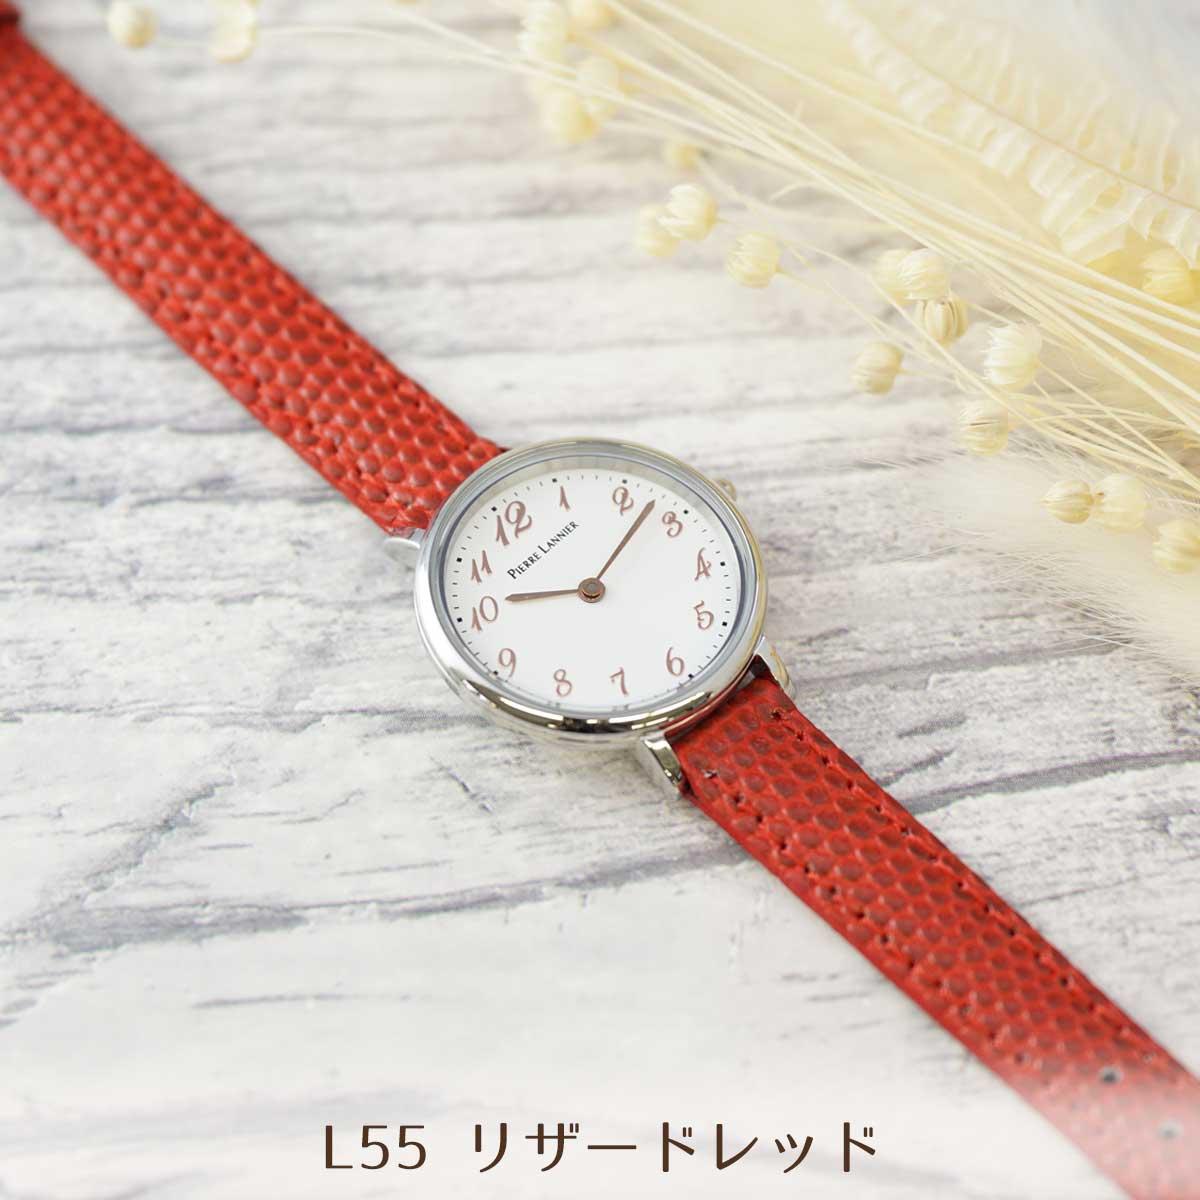 8mm 腕時計ベルト ロワール 牛革リザード型押し フランス製